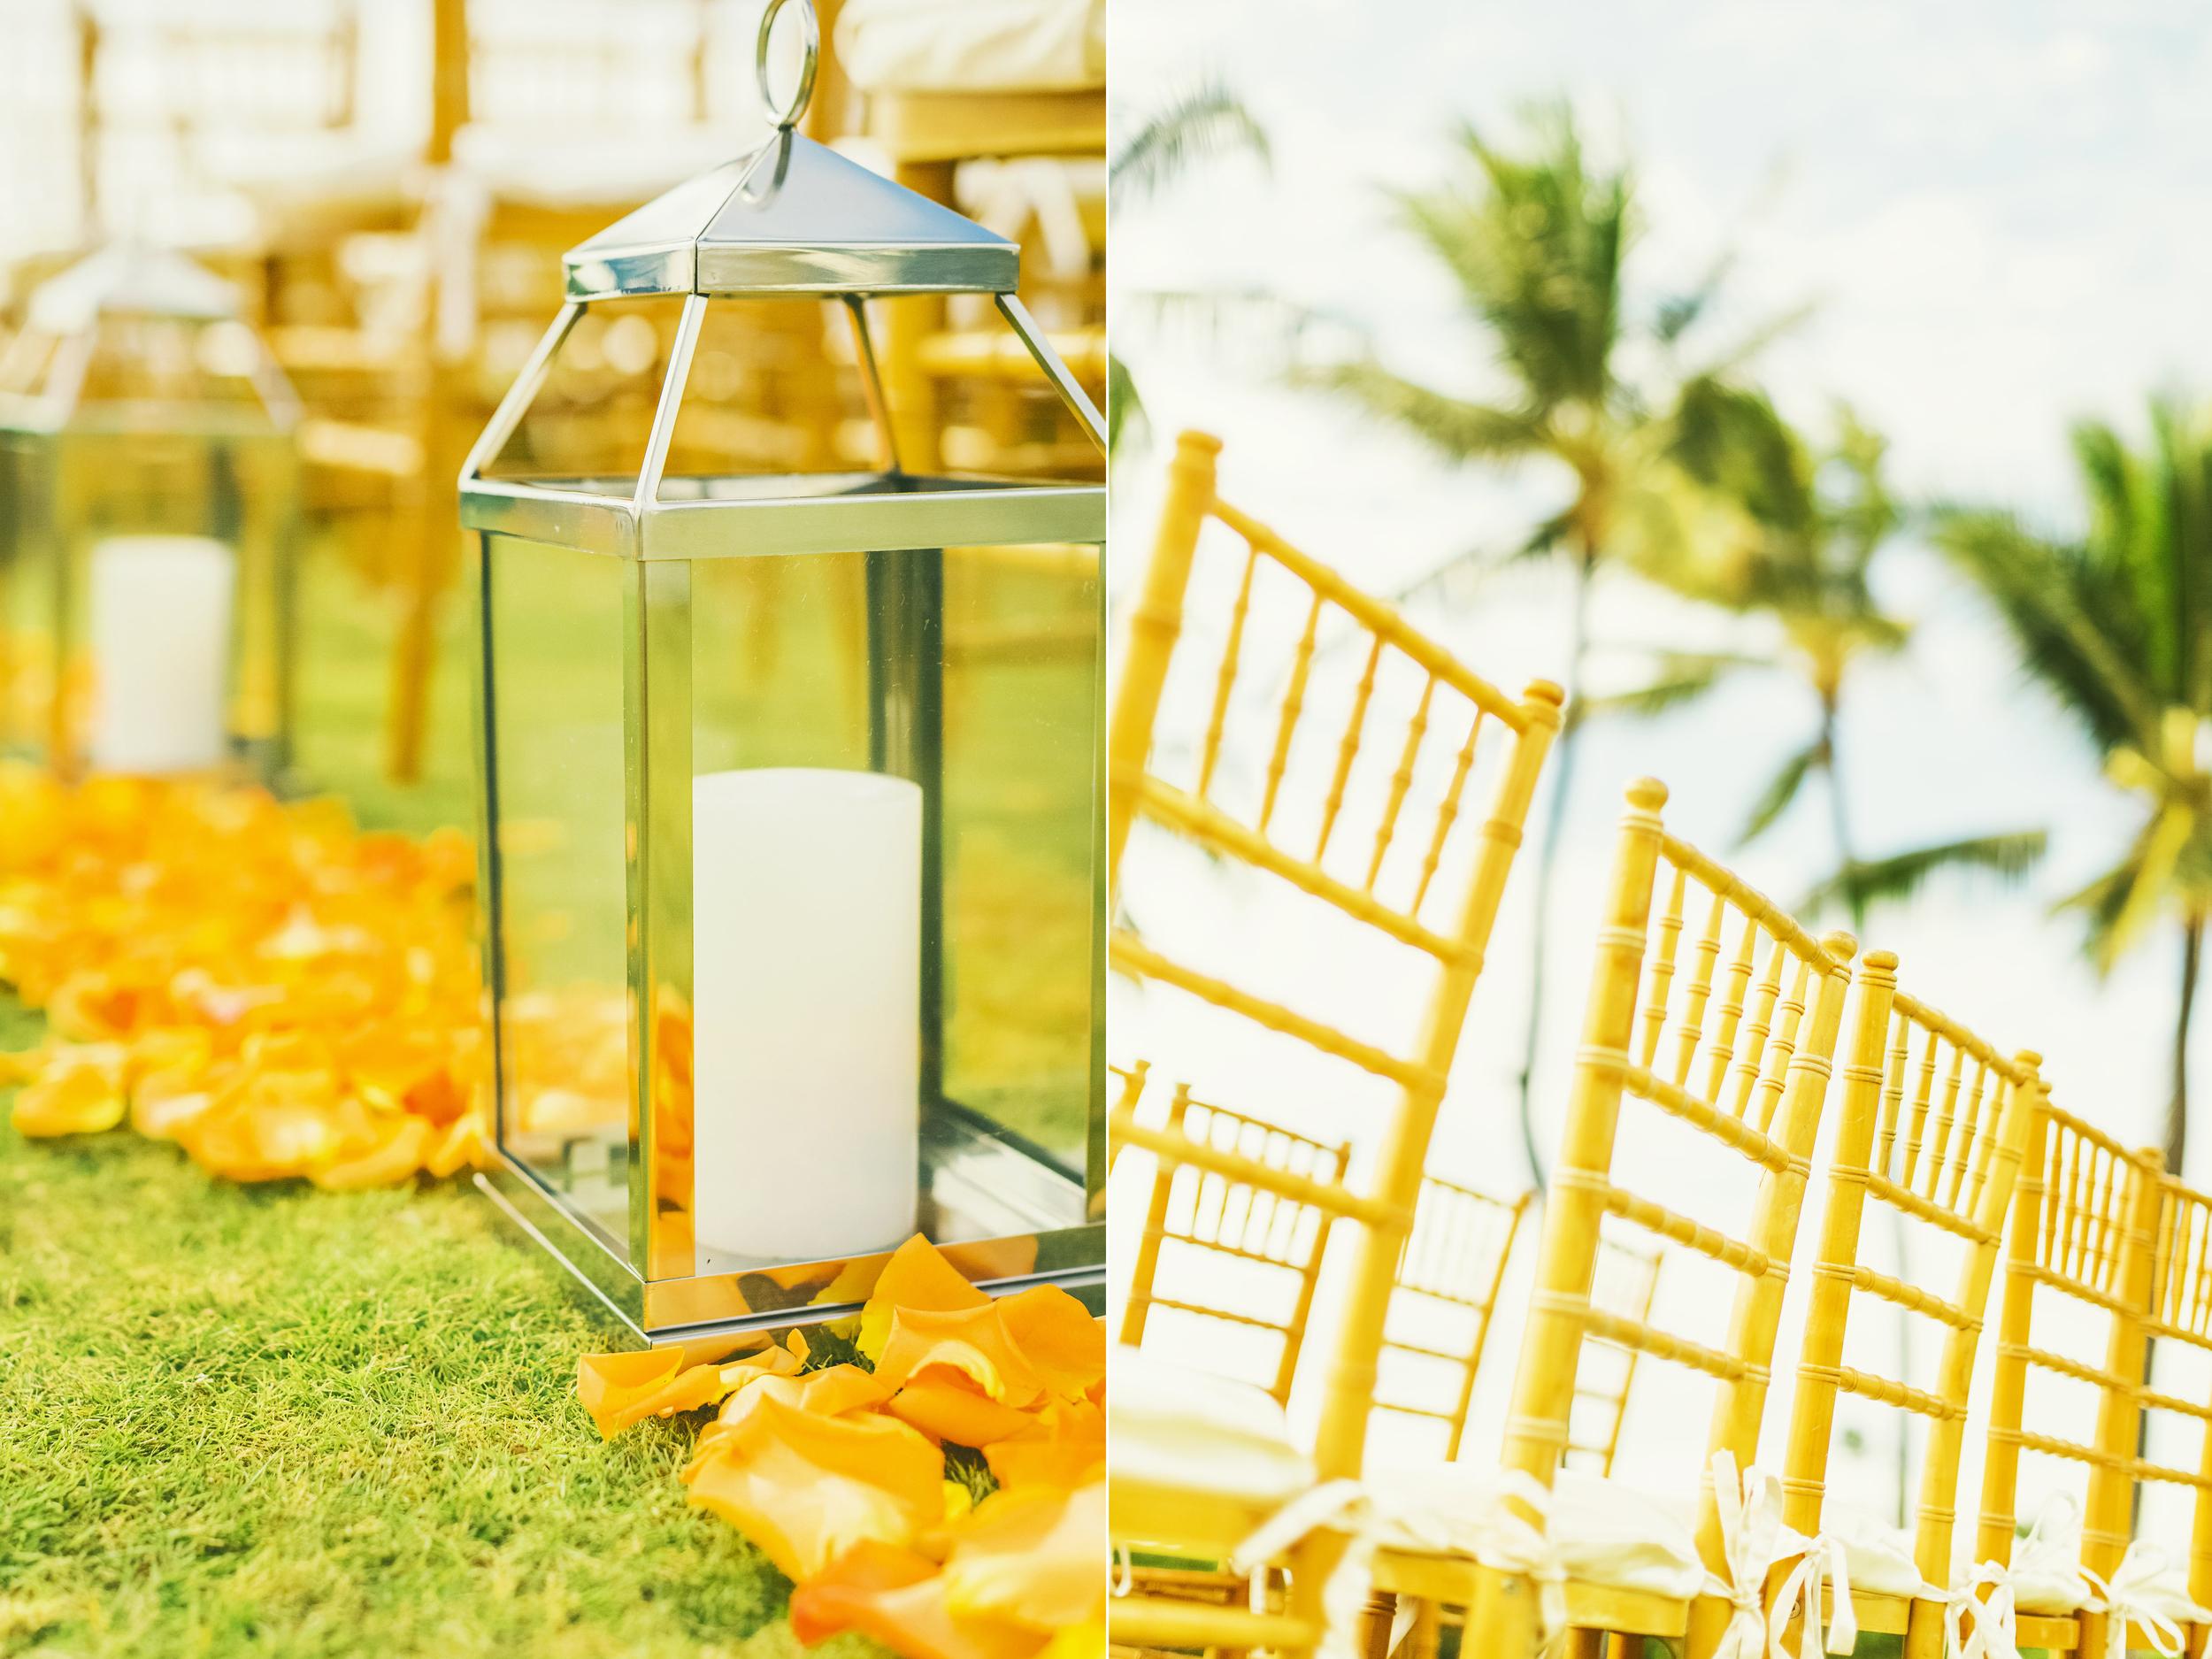 angie-diaz-photography-oahu-wedding-lanikuhonoa-shenshen-marshall-22.jpg